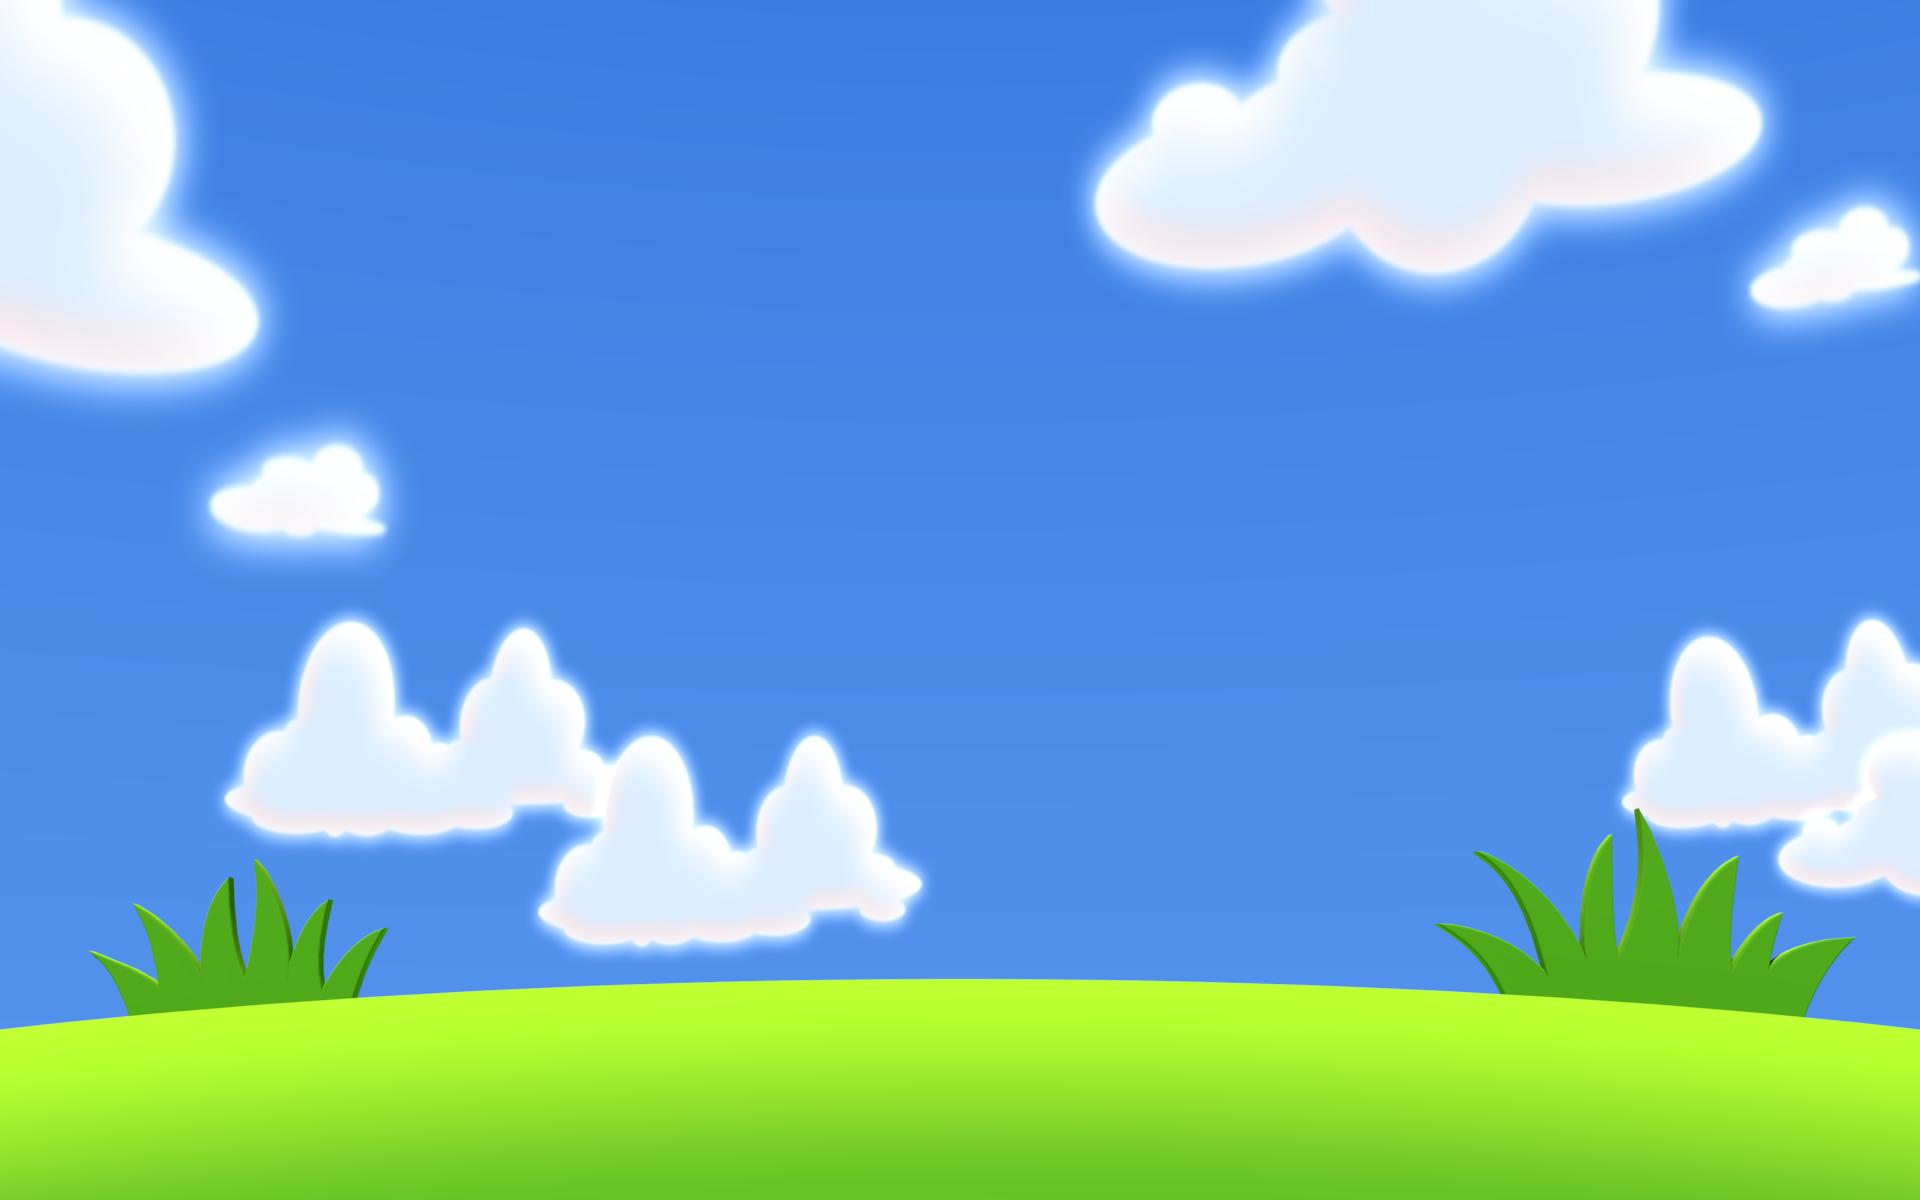 Background Clipart Best Animation Background Clip Art Background Clipart